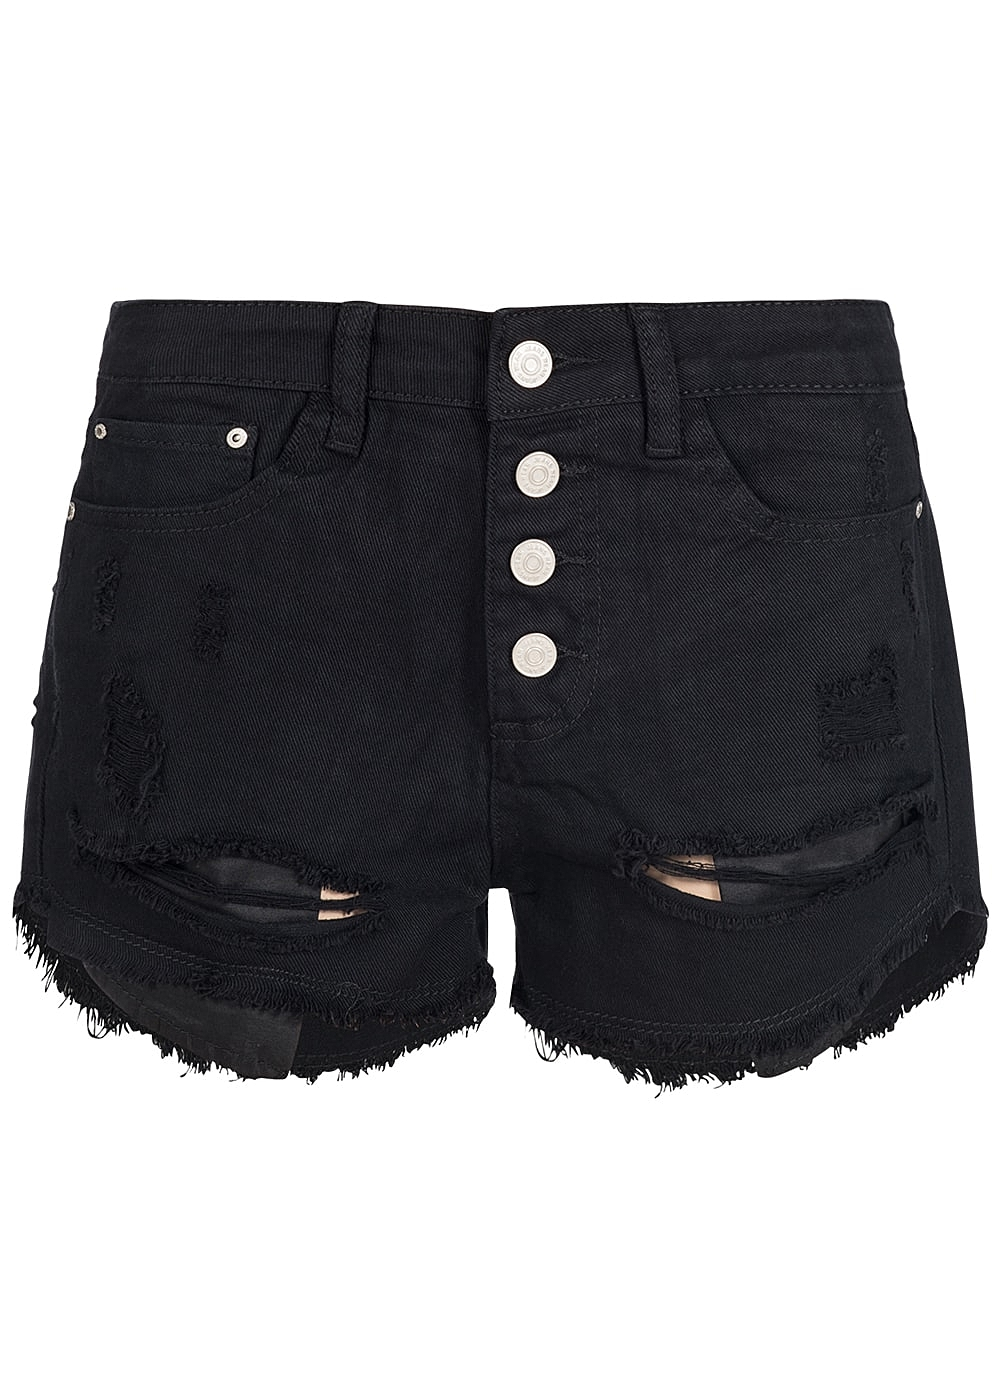 hailys damen jeans short destroy look 5 pockets knopfreihe schwarz 77onlineshop. Black Bedroom Furniture Sets. Home Design Ideas